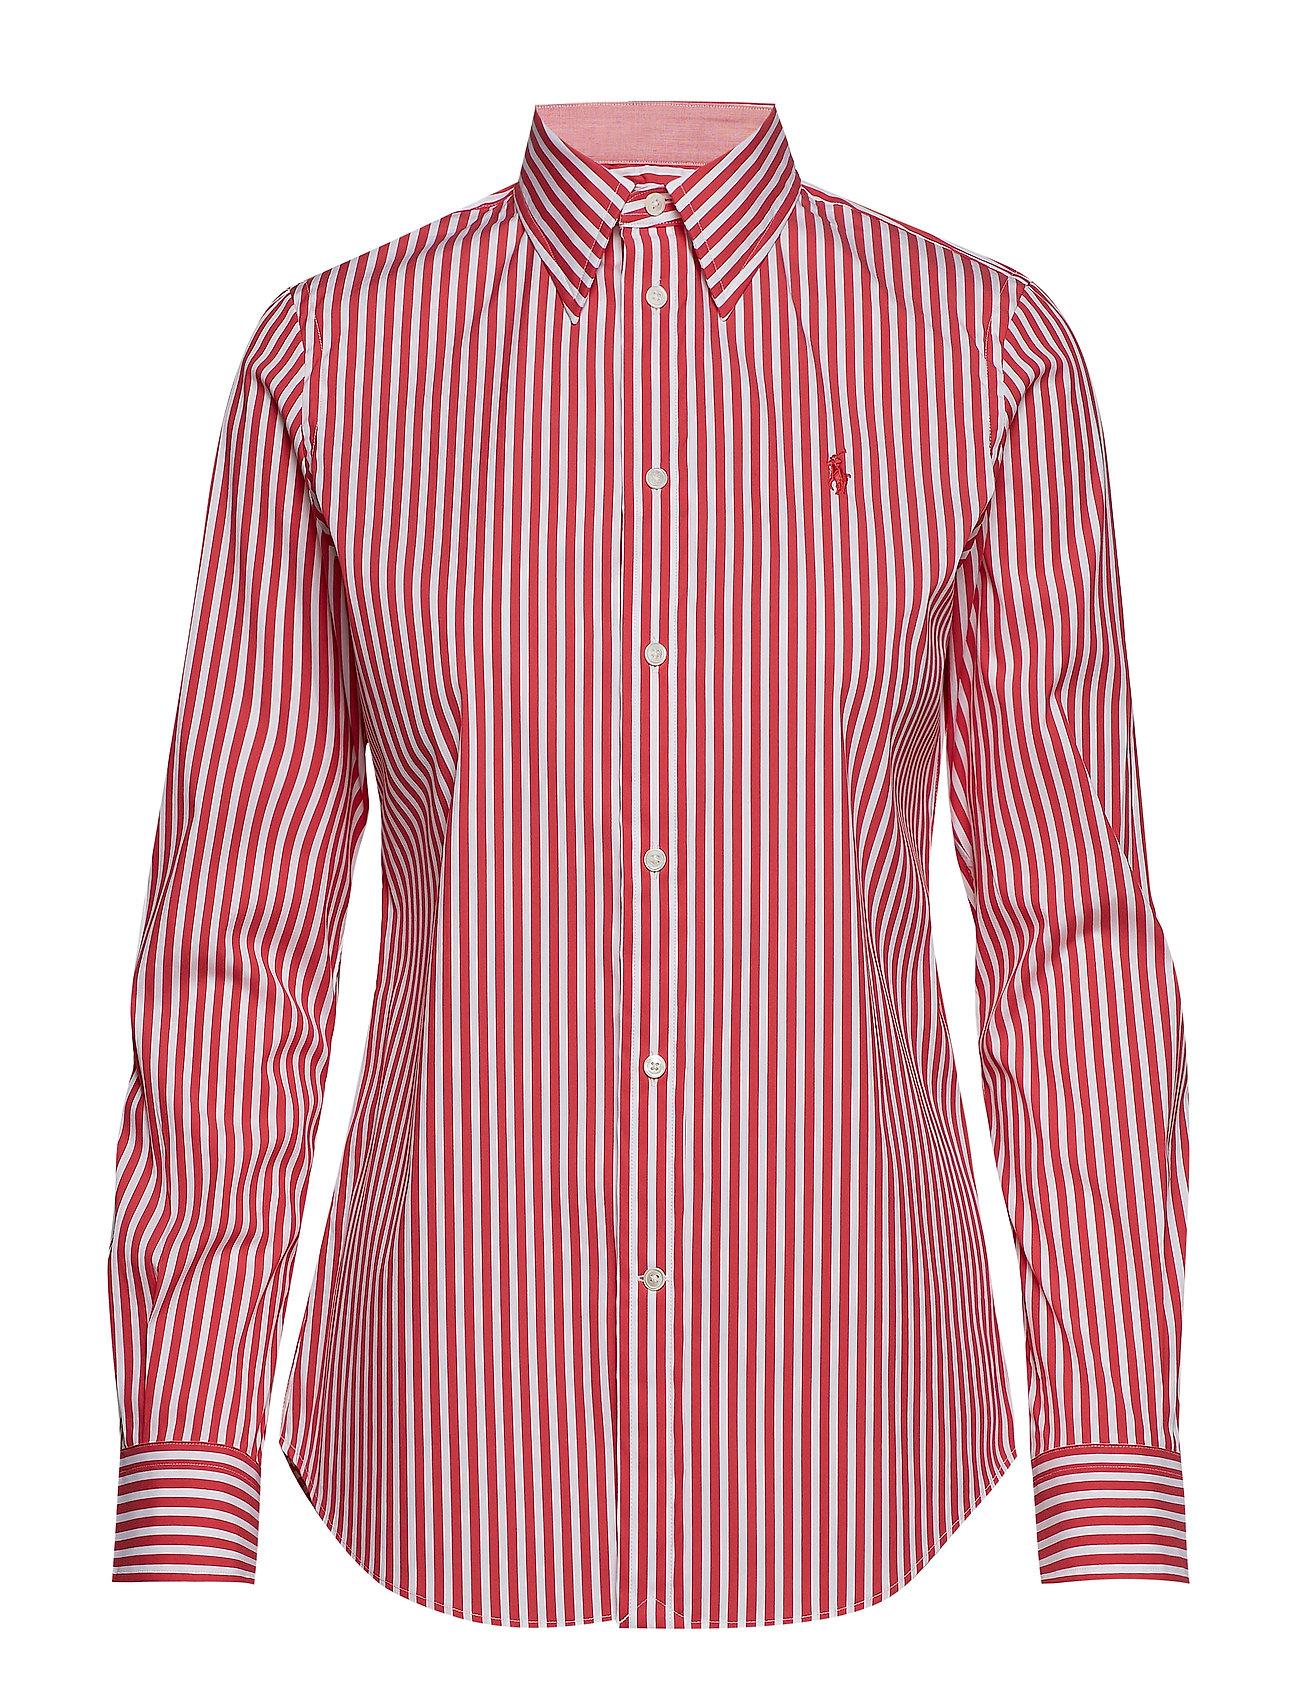 Polo Ralph Lauren Stretch Slim Fit Striped Shirt - 952J WHITE/CACTUS